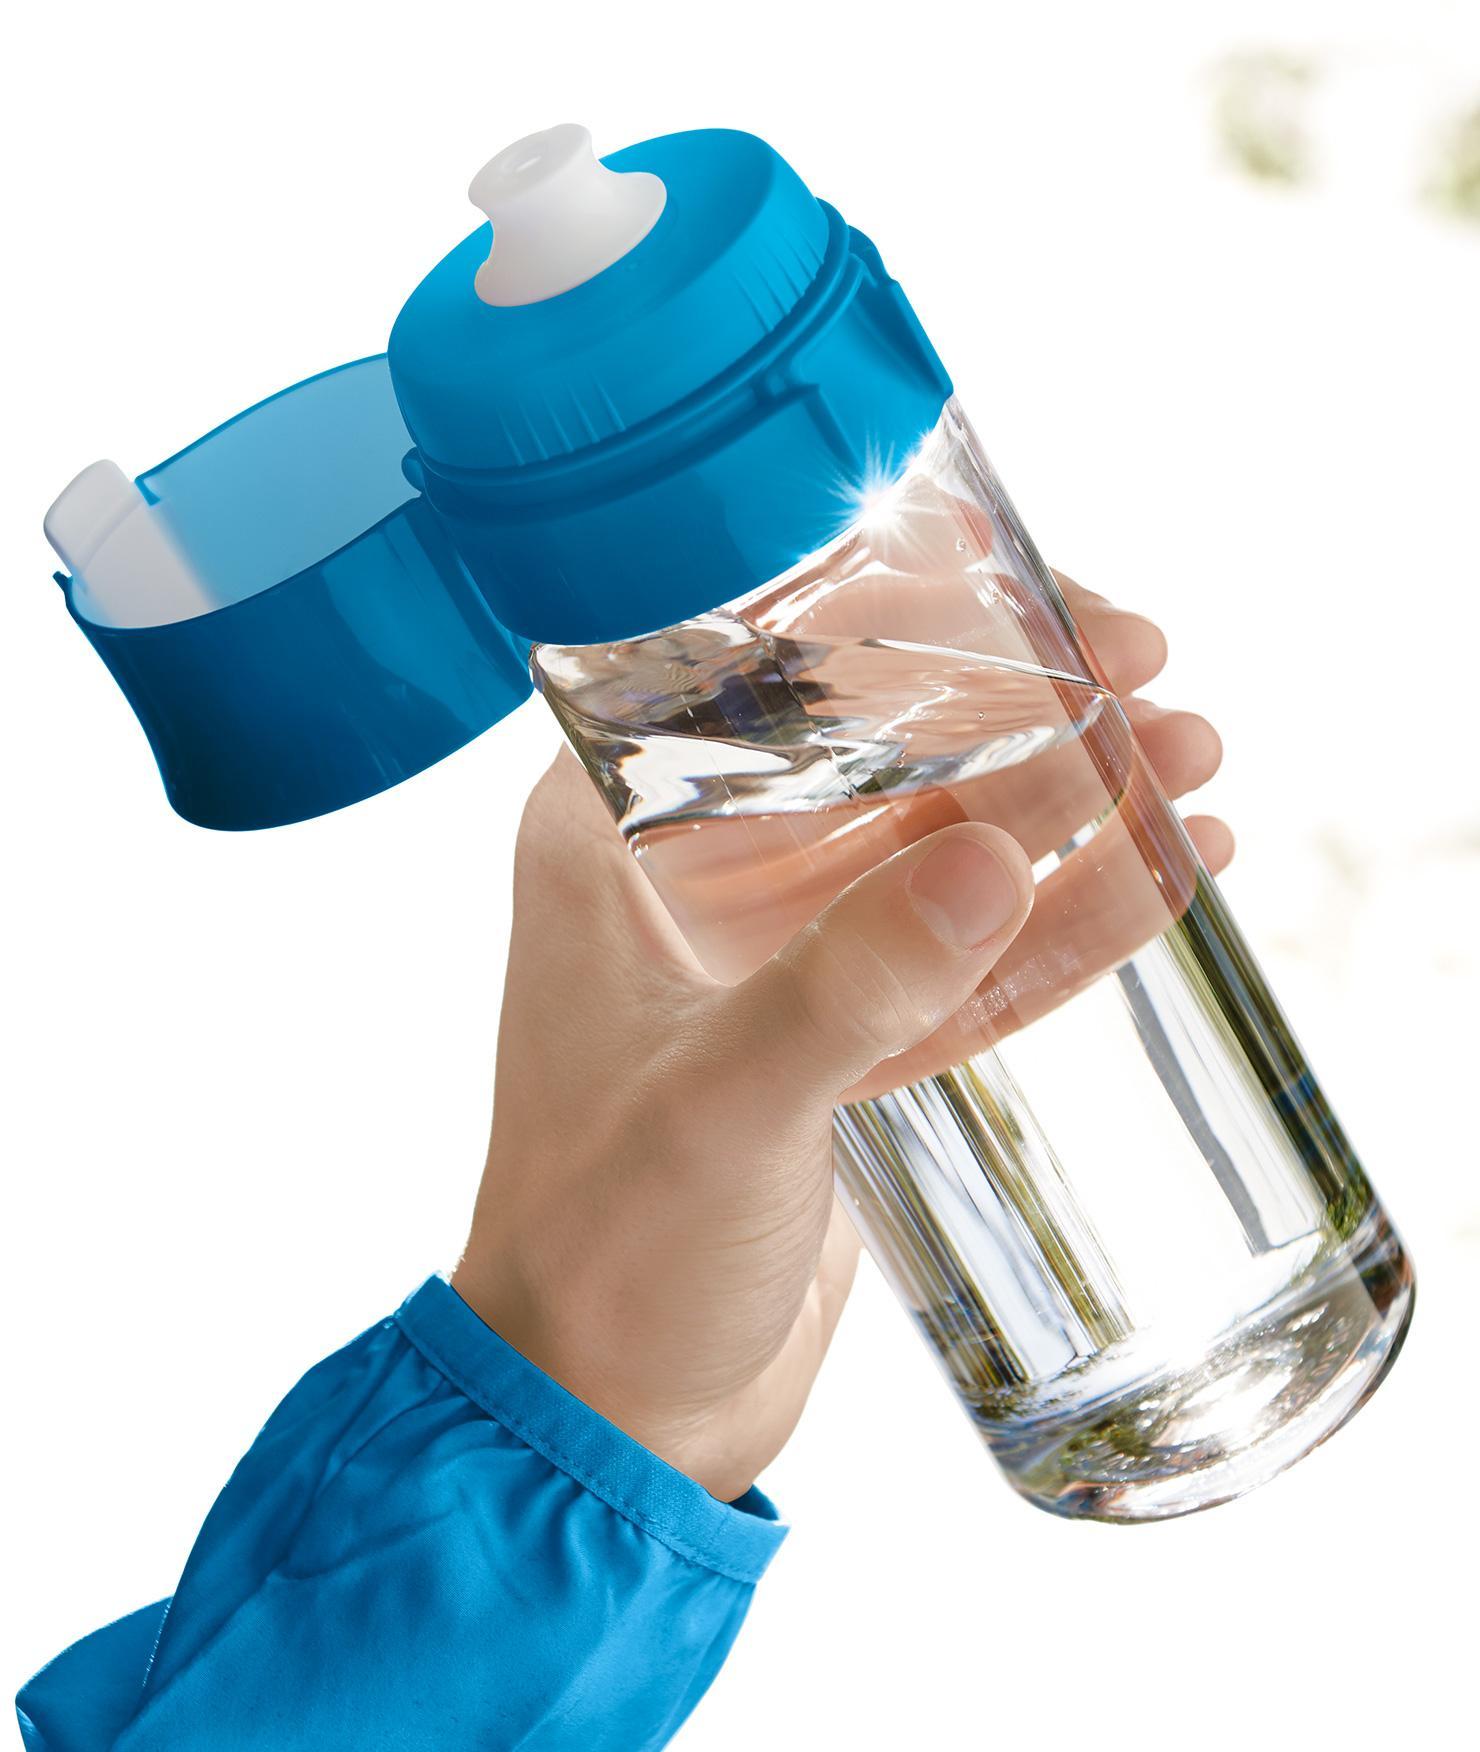 BRITA fill&go Vital 藍色 公園 男人 運動 水瓶